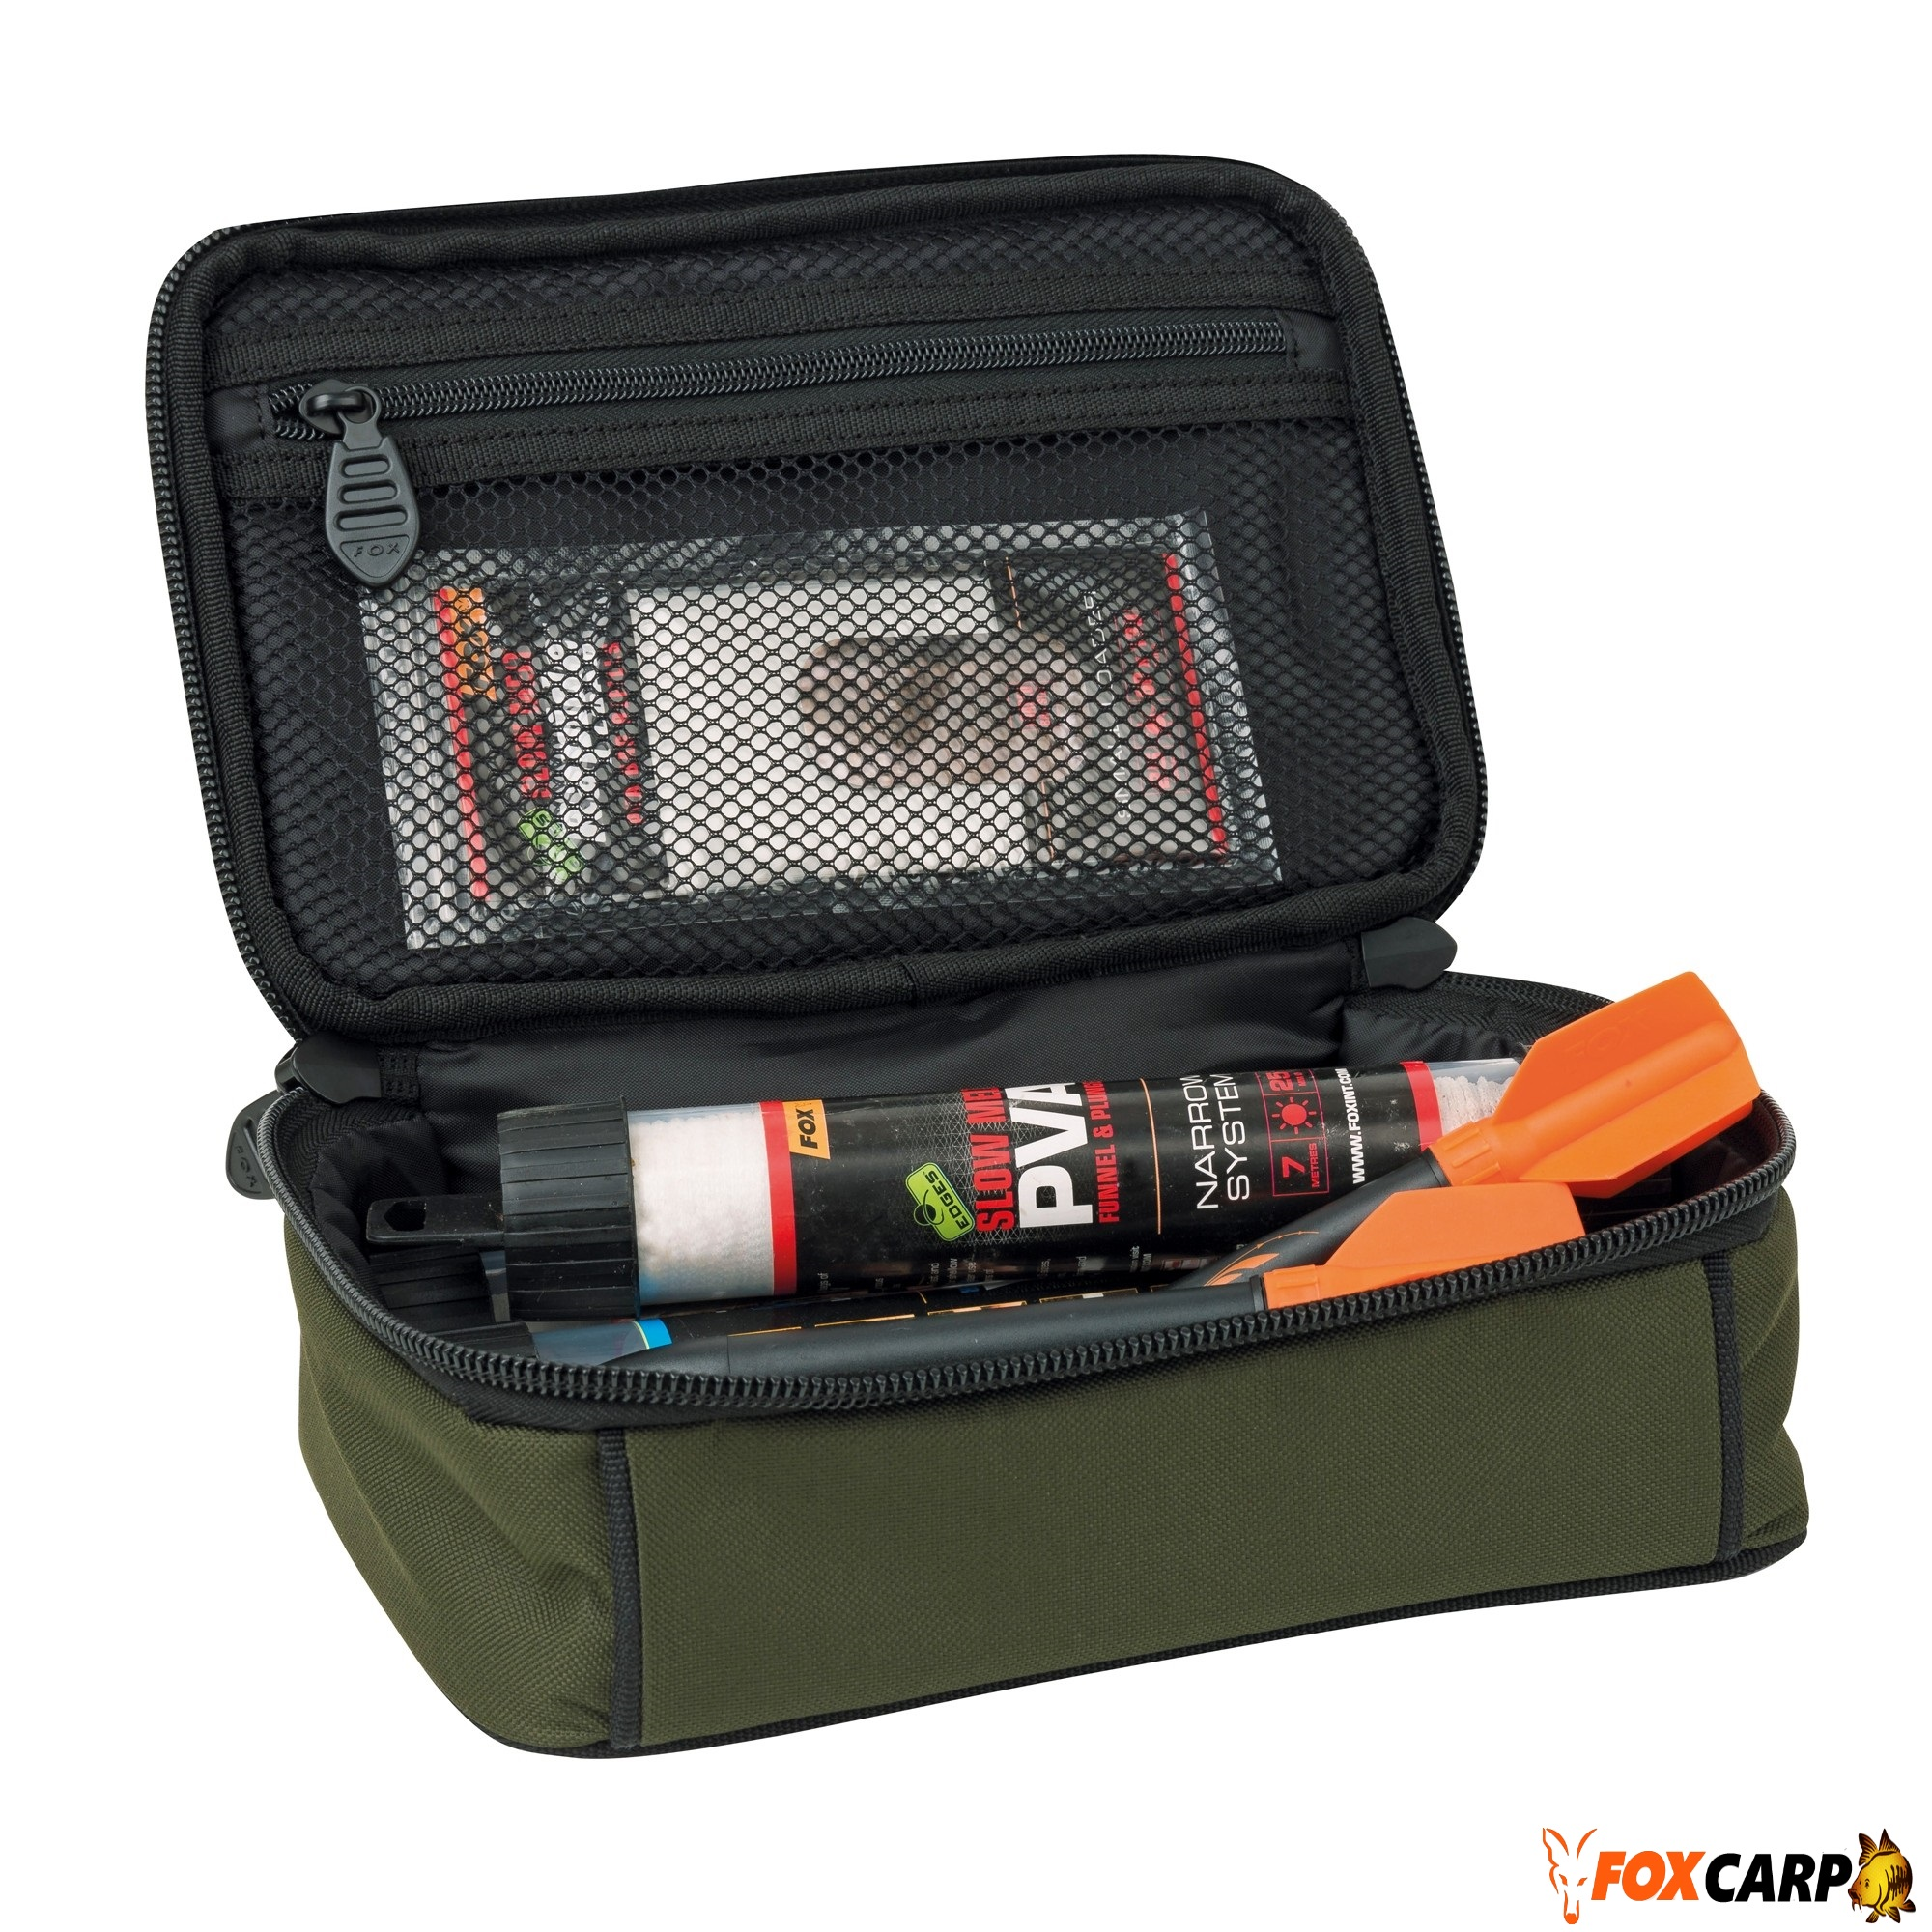 FOX Accessory Bag Large R-SERIES (Сумка для аксессуаров)